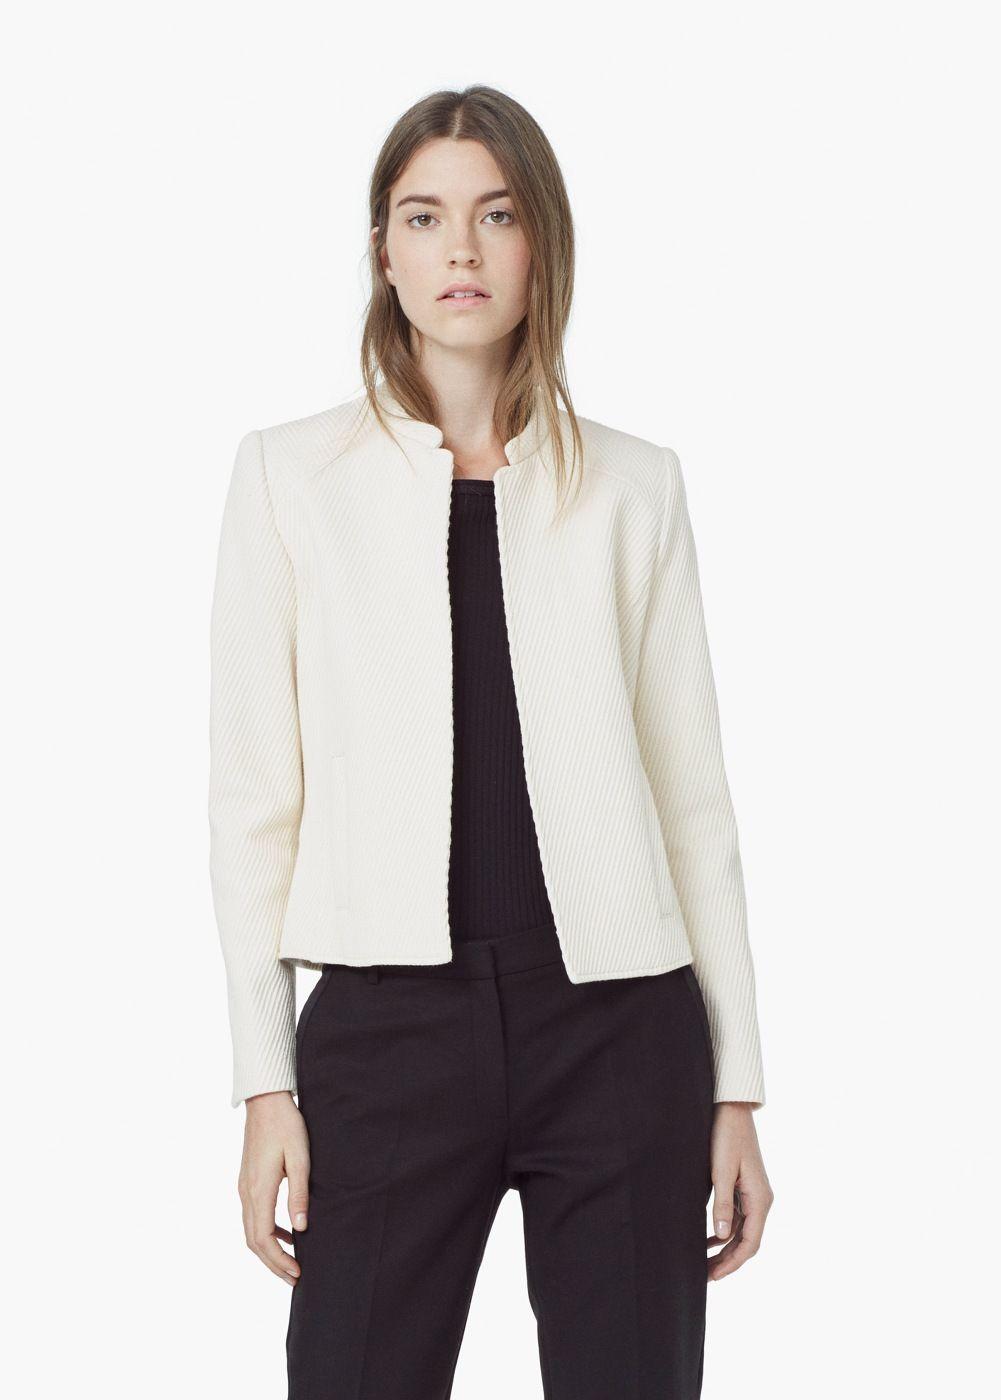 Chaqueta textura algodón - Chaquetas de Mujer  2f0e344d91d4